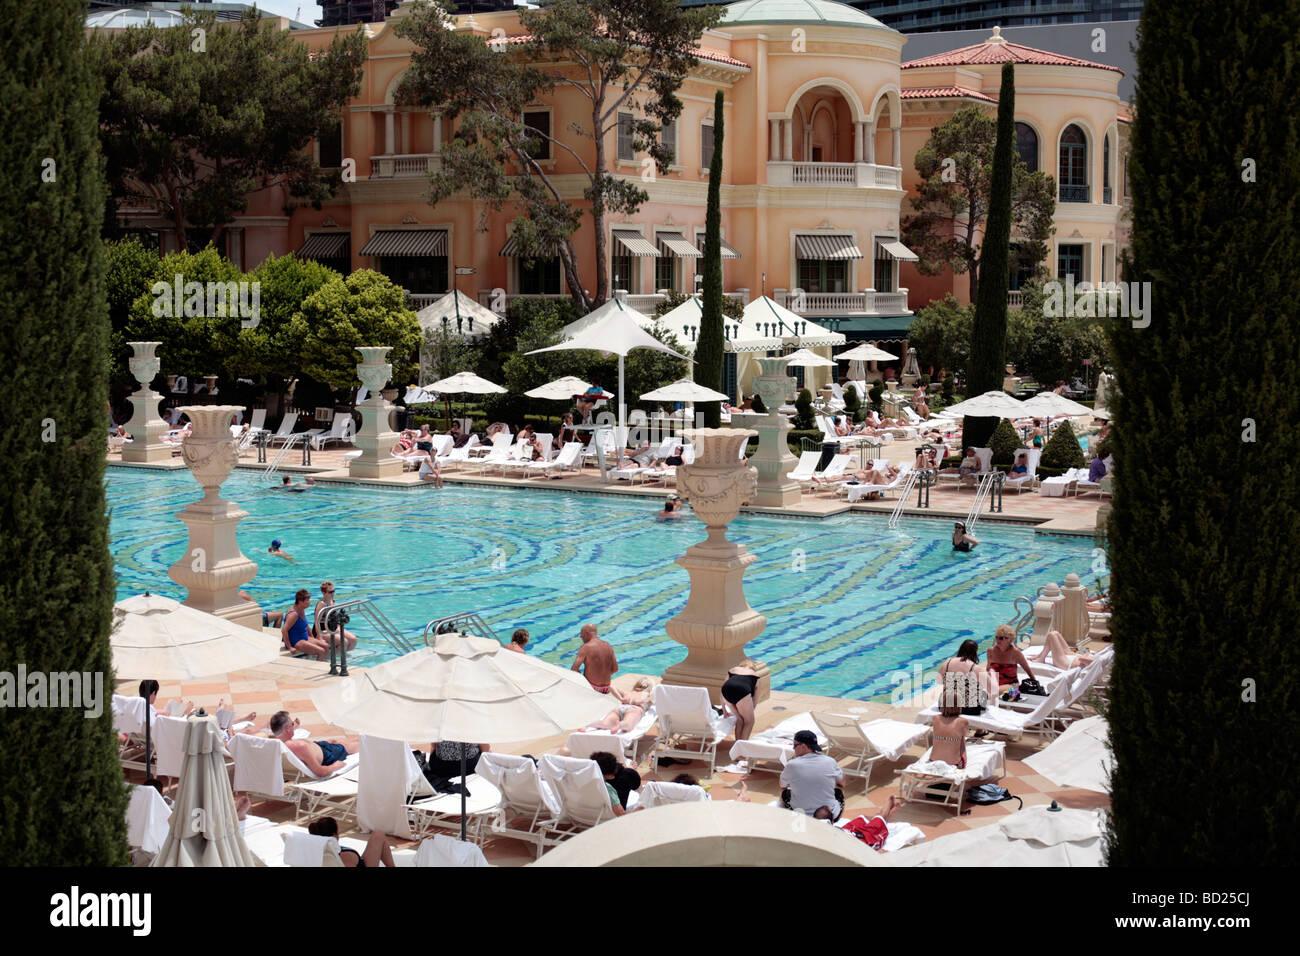 Piscina al Bellagio Hotel Las Vegas Foto  Immagine Stock 25249074  Alamy